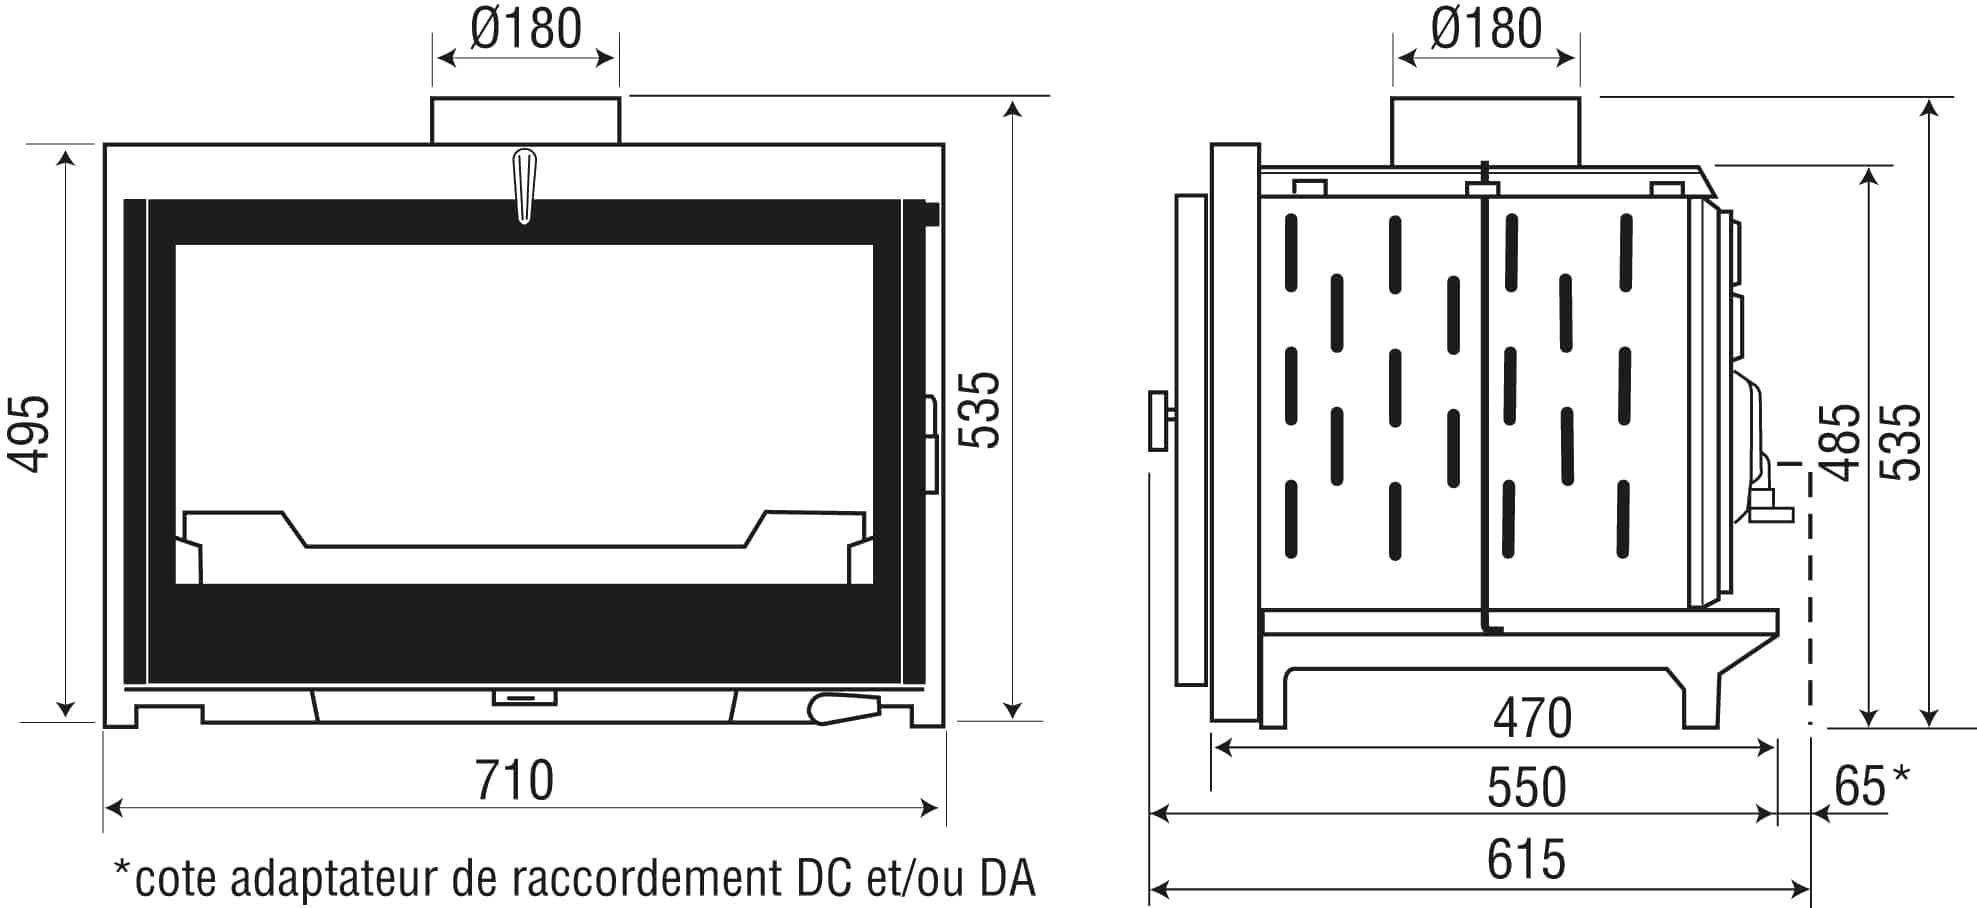 F1900I visio7 insert schema hd - Insert VISIO 7